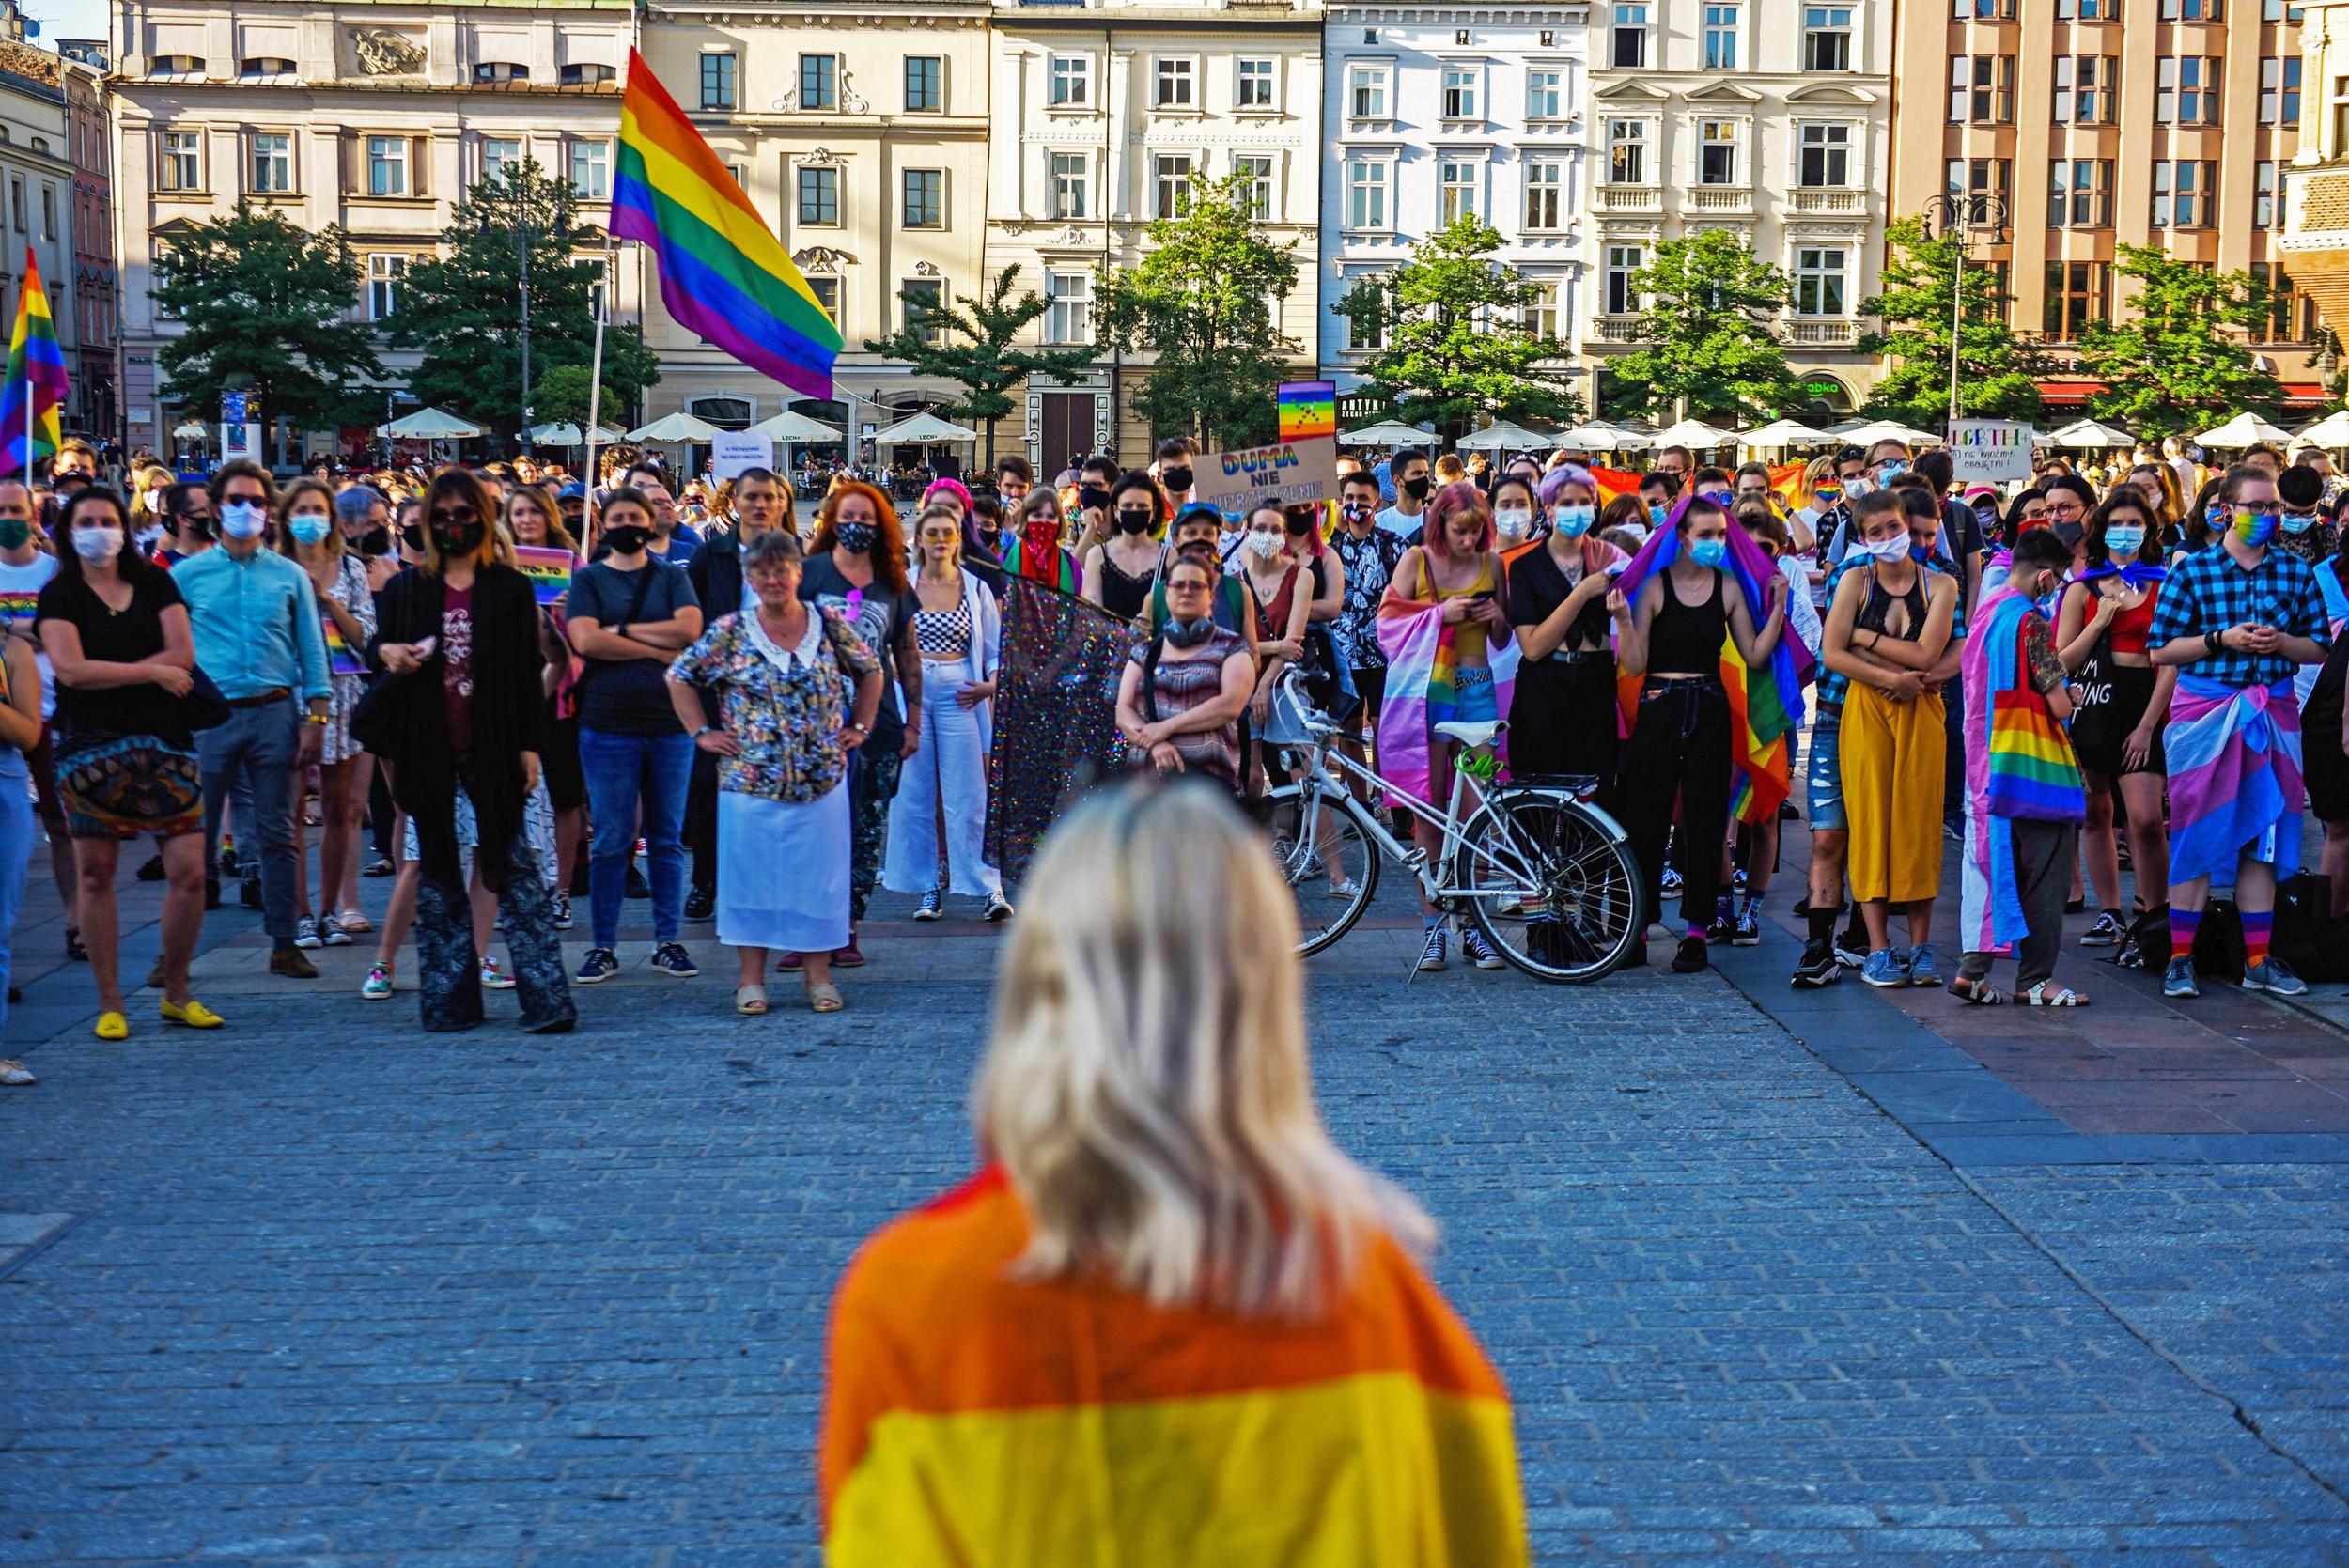 Gay Bad Stockholm